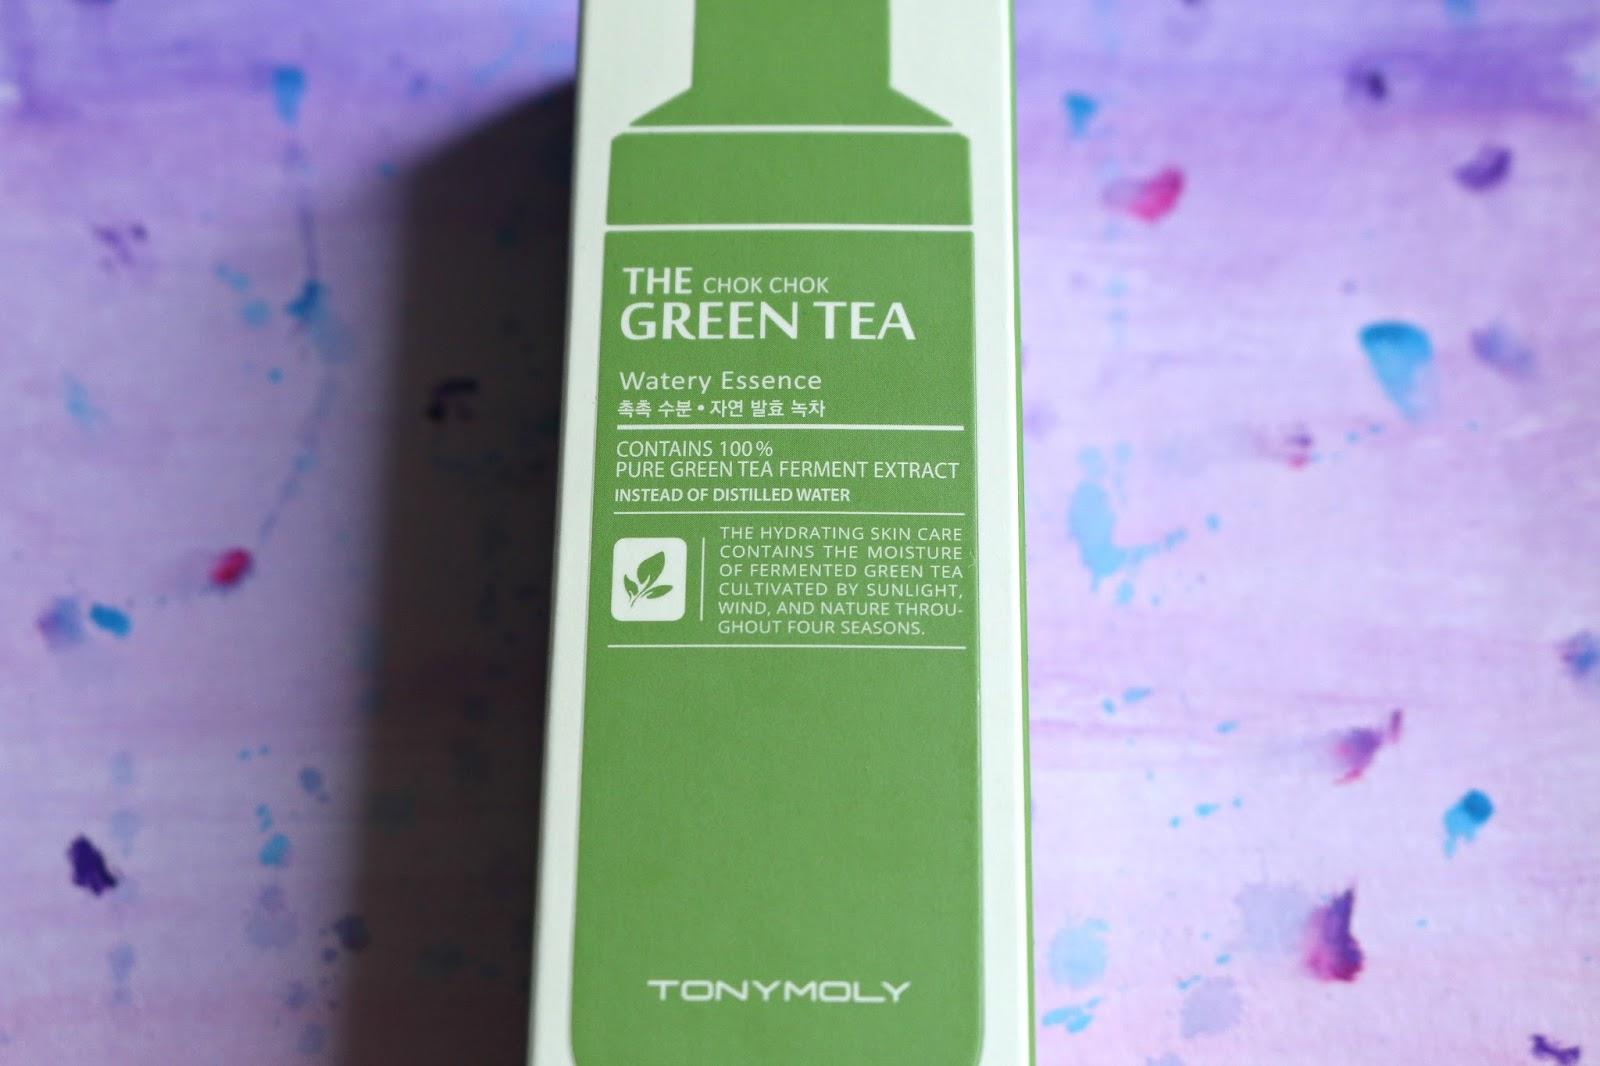 The Chok Chok Green Tea Watery Essence by TONYMOLY #19